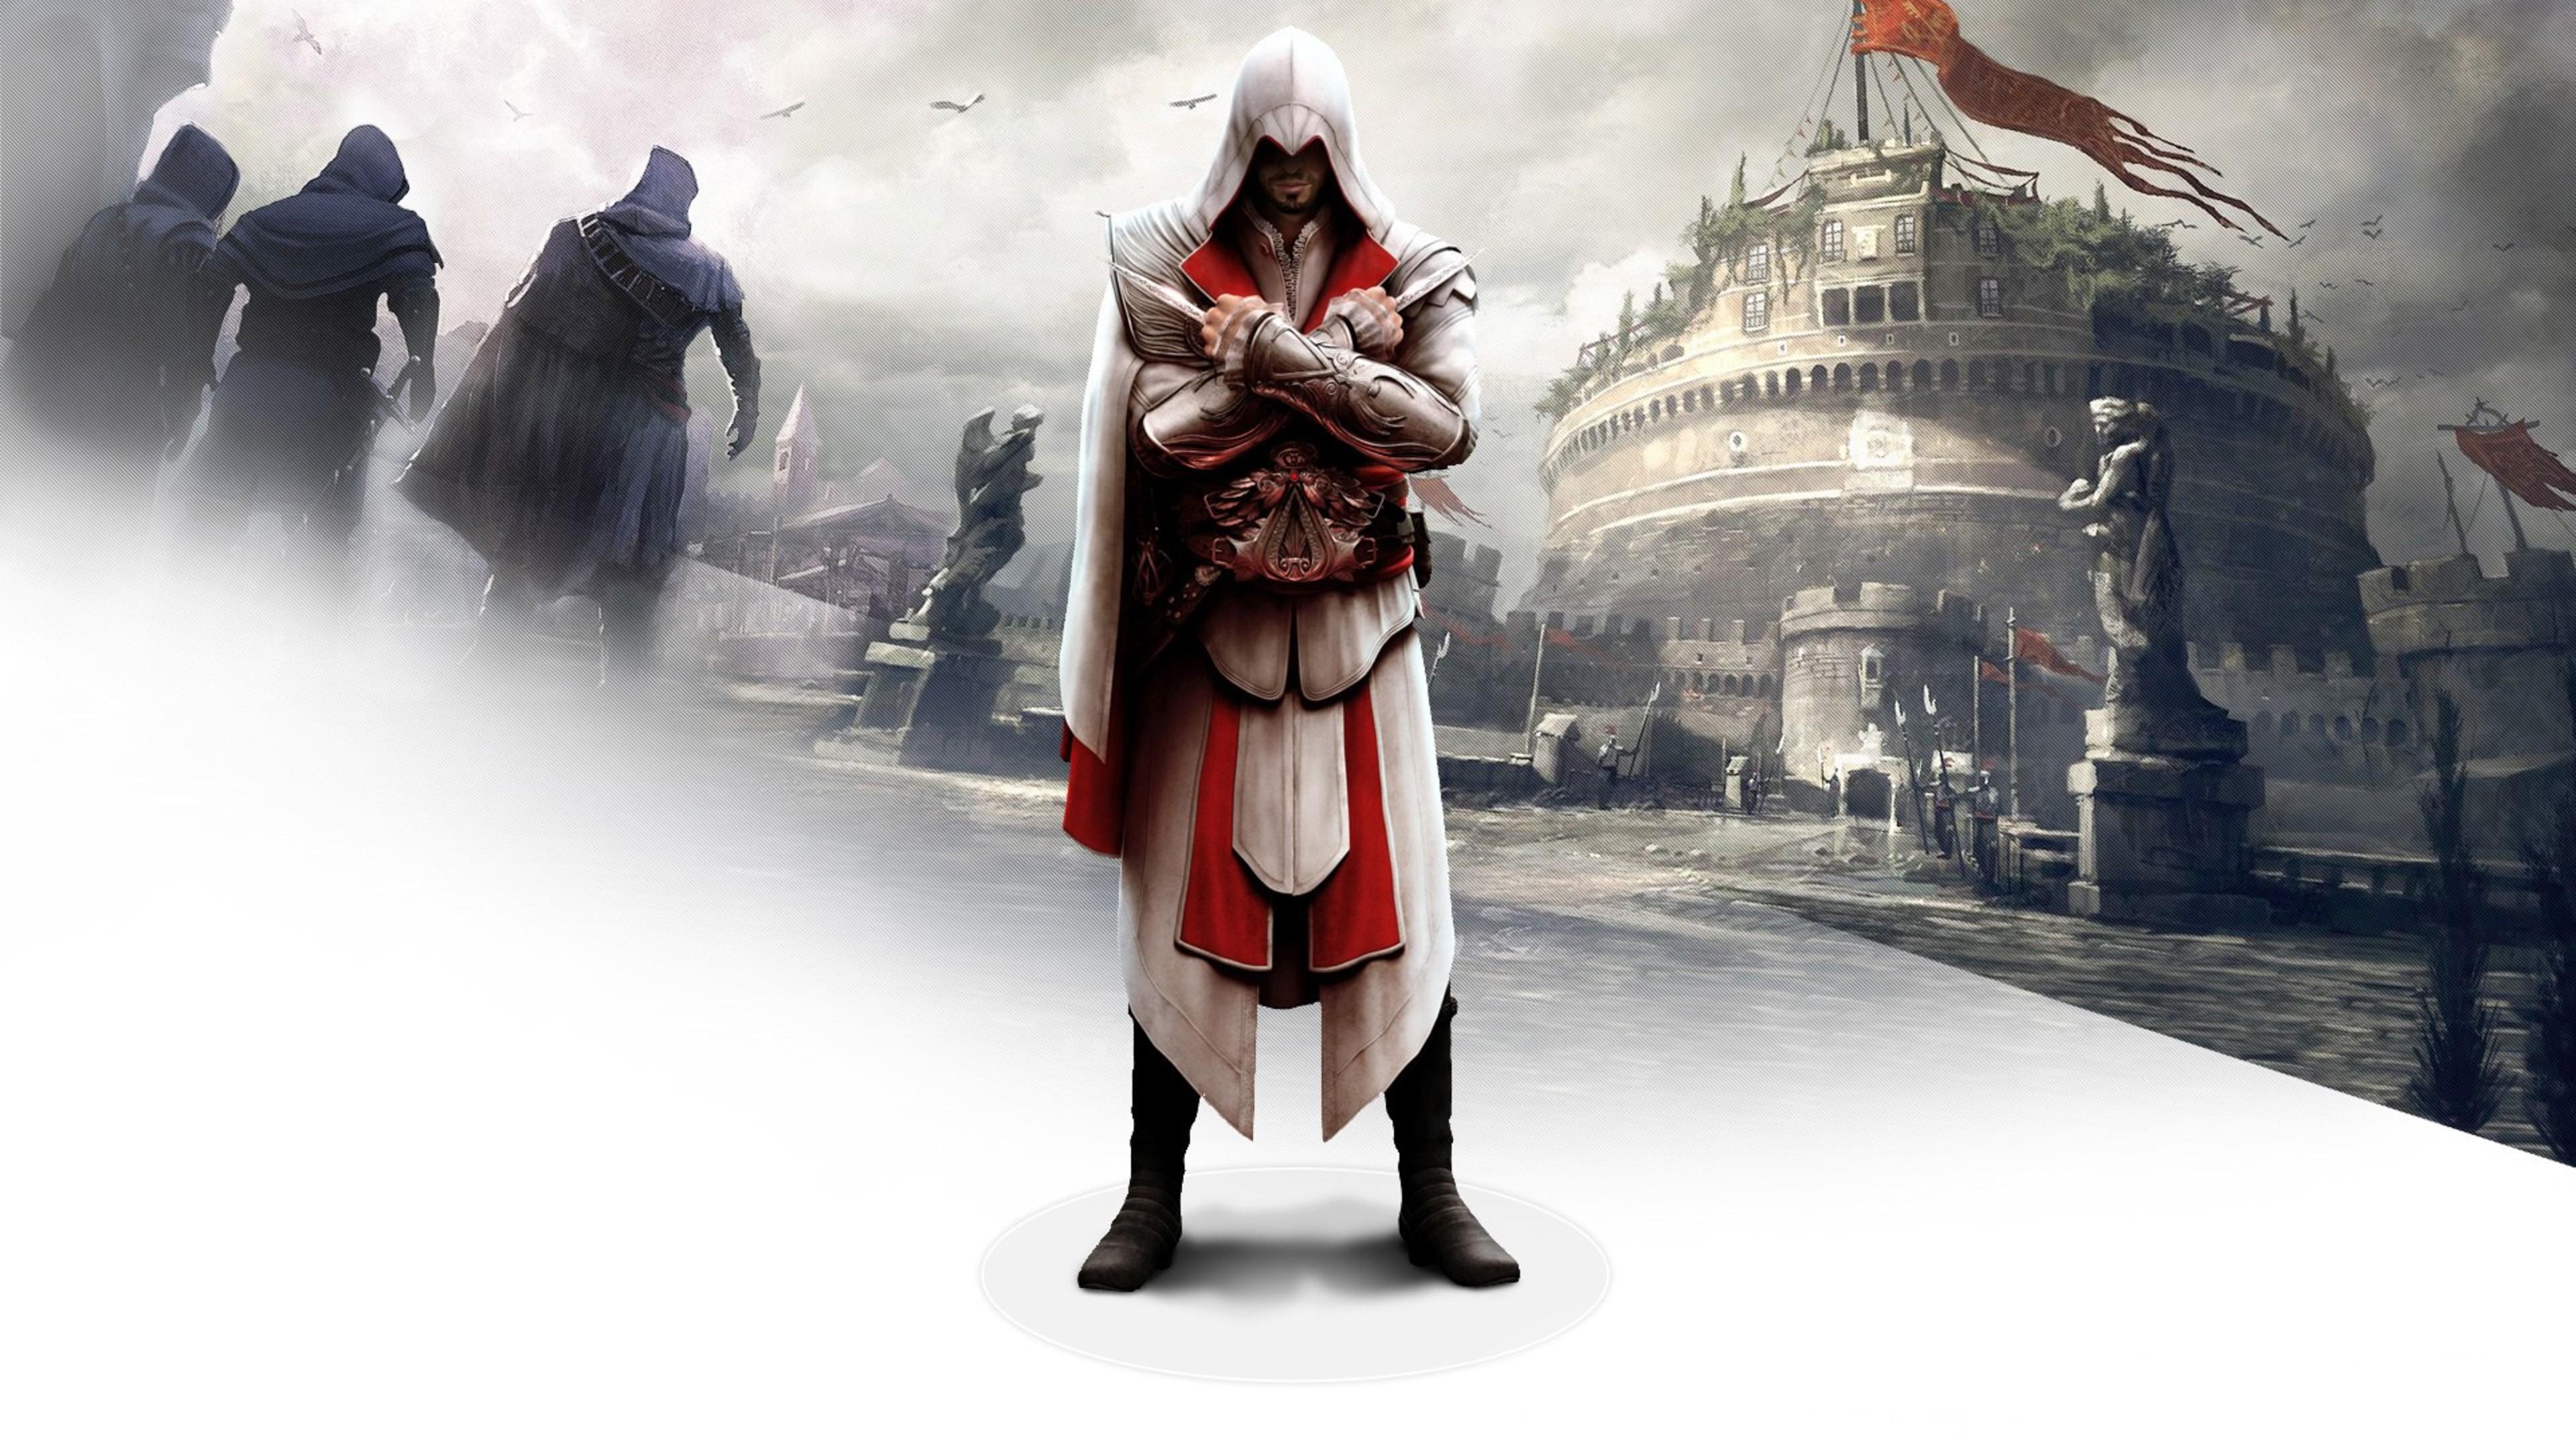 ezio in assassins creed brotherhood 1535967226 - Ezio In Assassins Creed Brotherhood - xbox games wallpapers, ps games wallpapers, pc games wallpapers, games wallpapers, assassins creed wallpapers